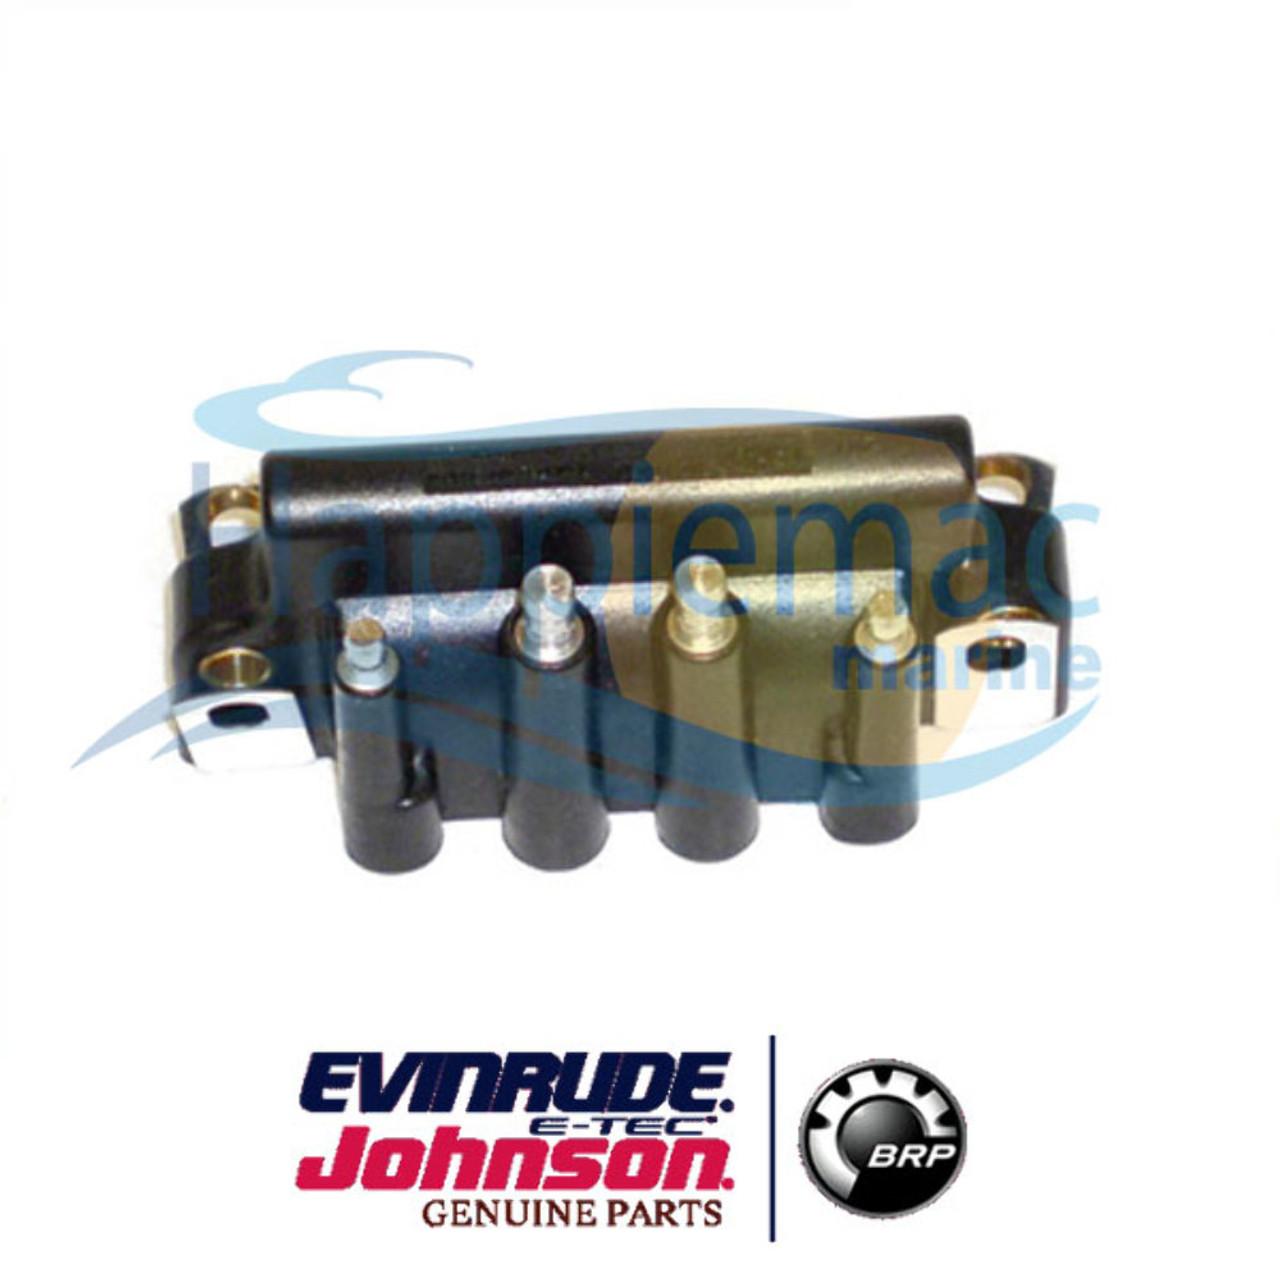 Johnson Evinrude OMC BRP OEM Dual Spark Plug Ignition Coil 583740 18-5170  183-3740